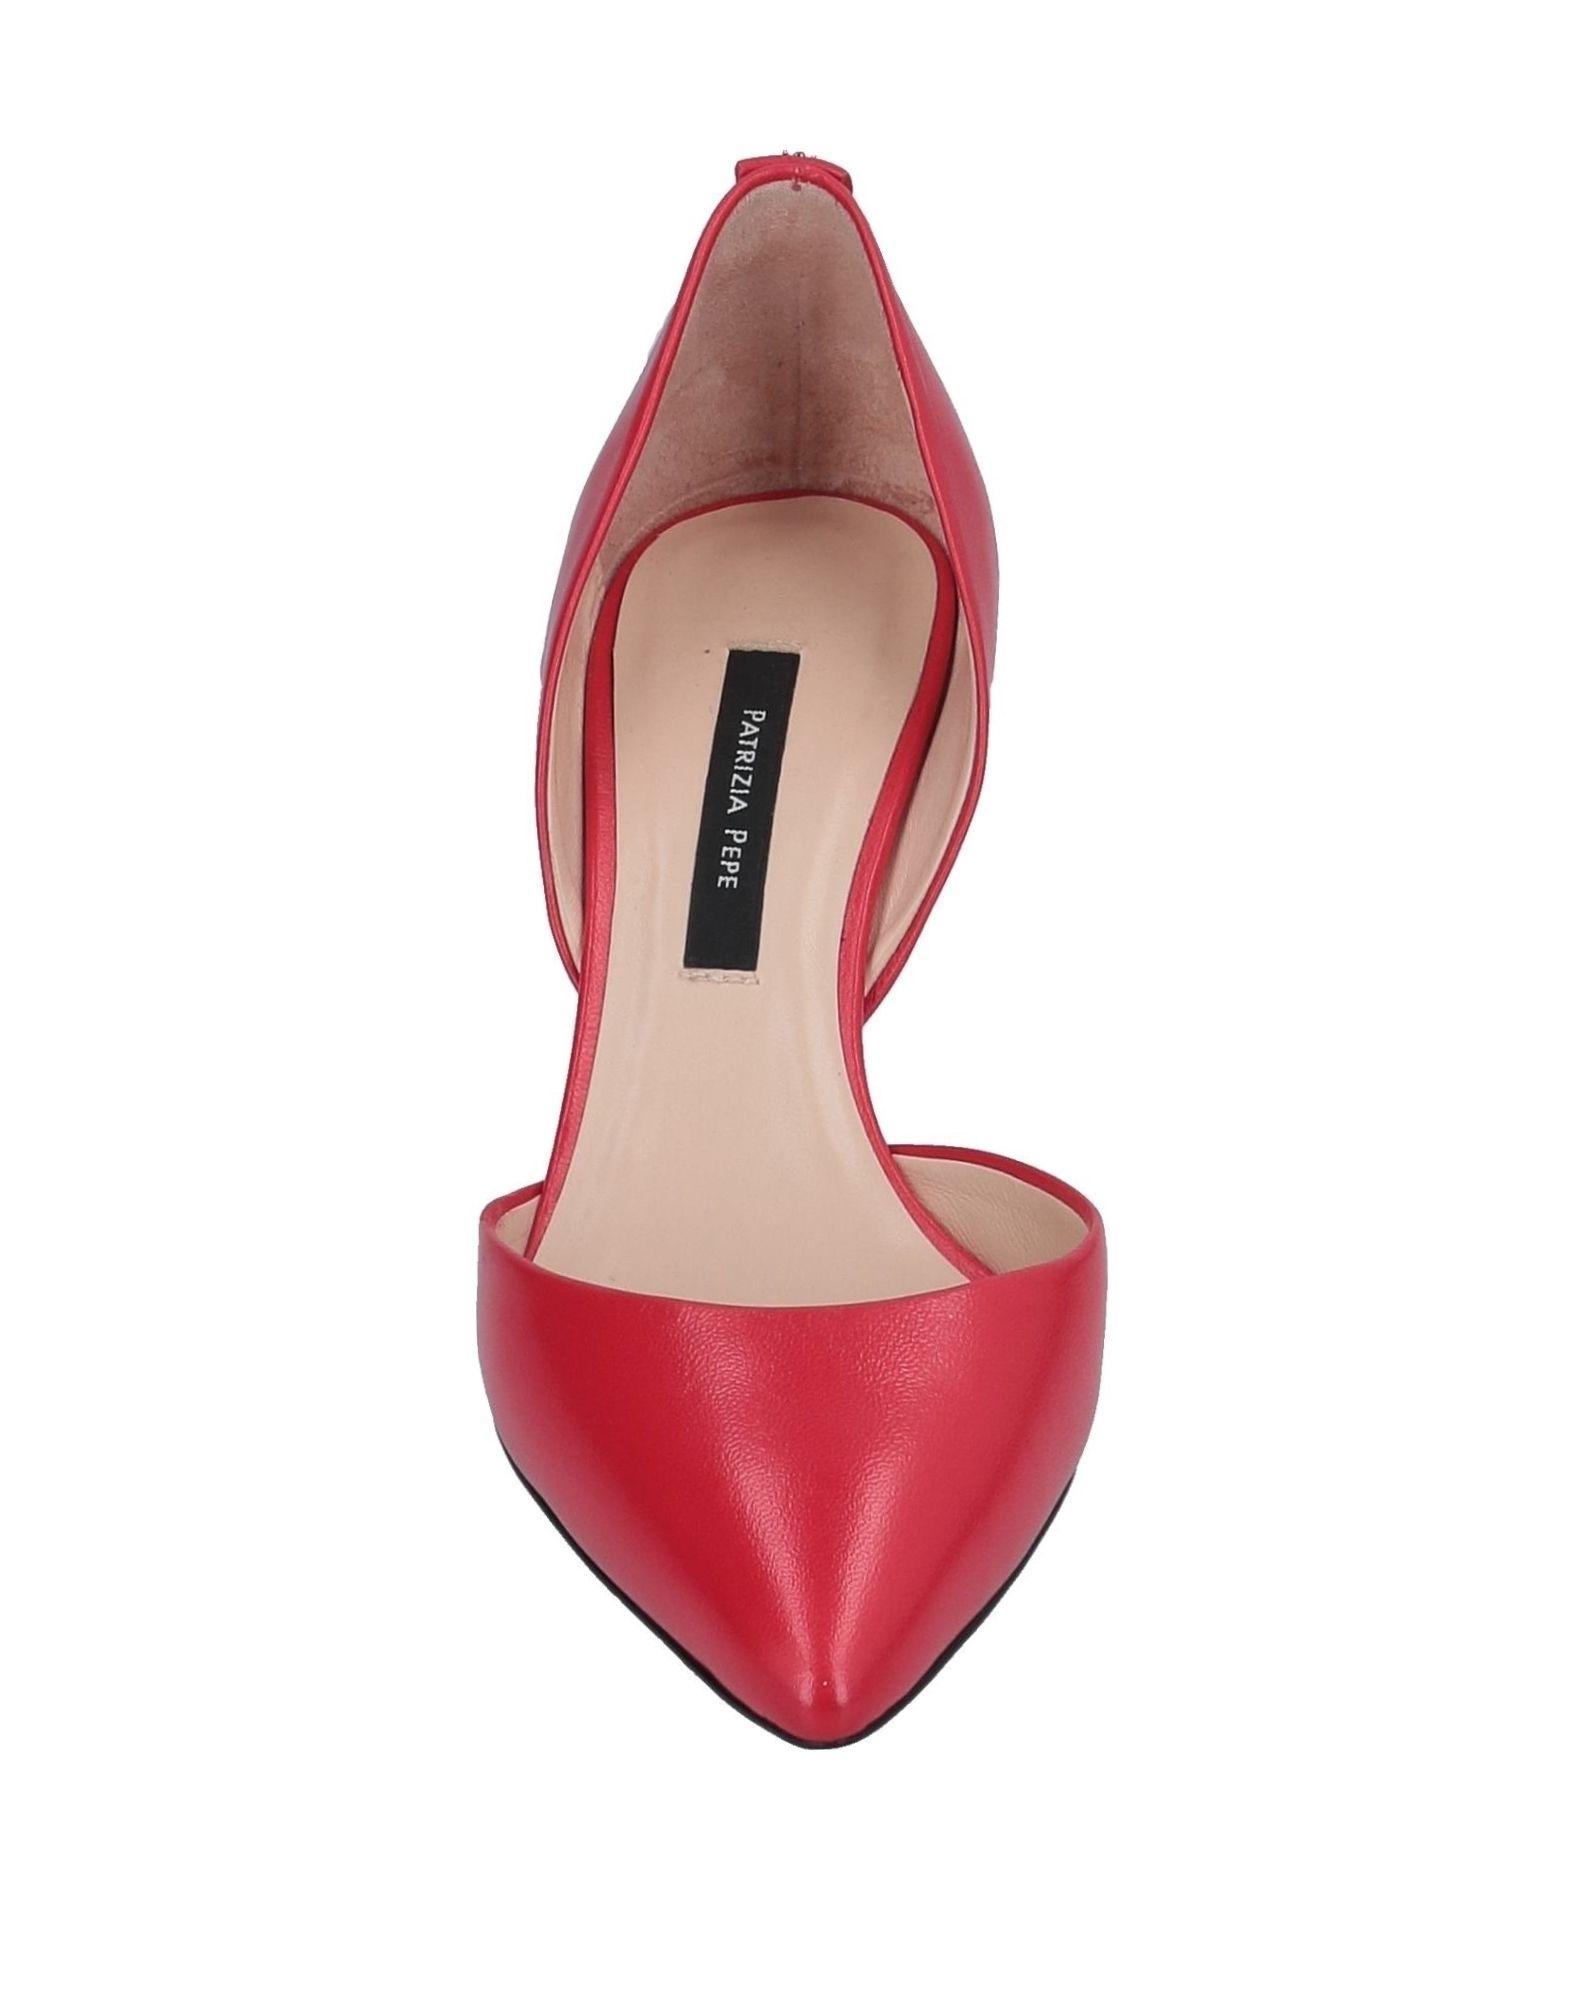 Stilvolle Pumps billige Schuhe Patrizia Pepe Pumps Stilvolle Damen  11555022TV b8a171